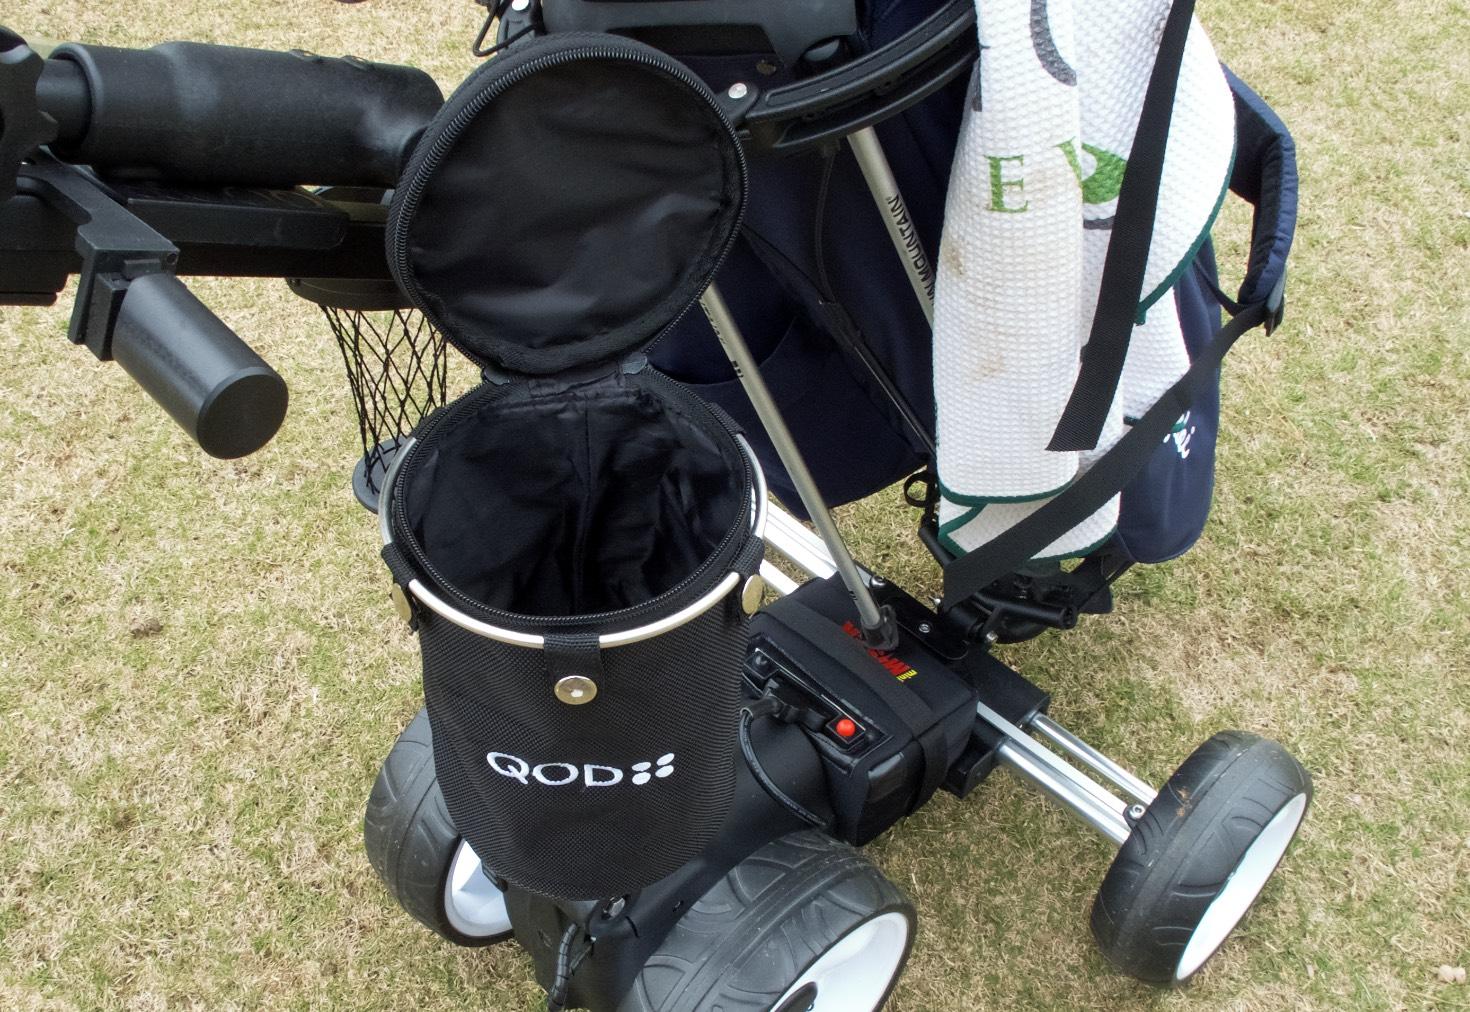 QOD Cart Storage Bag